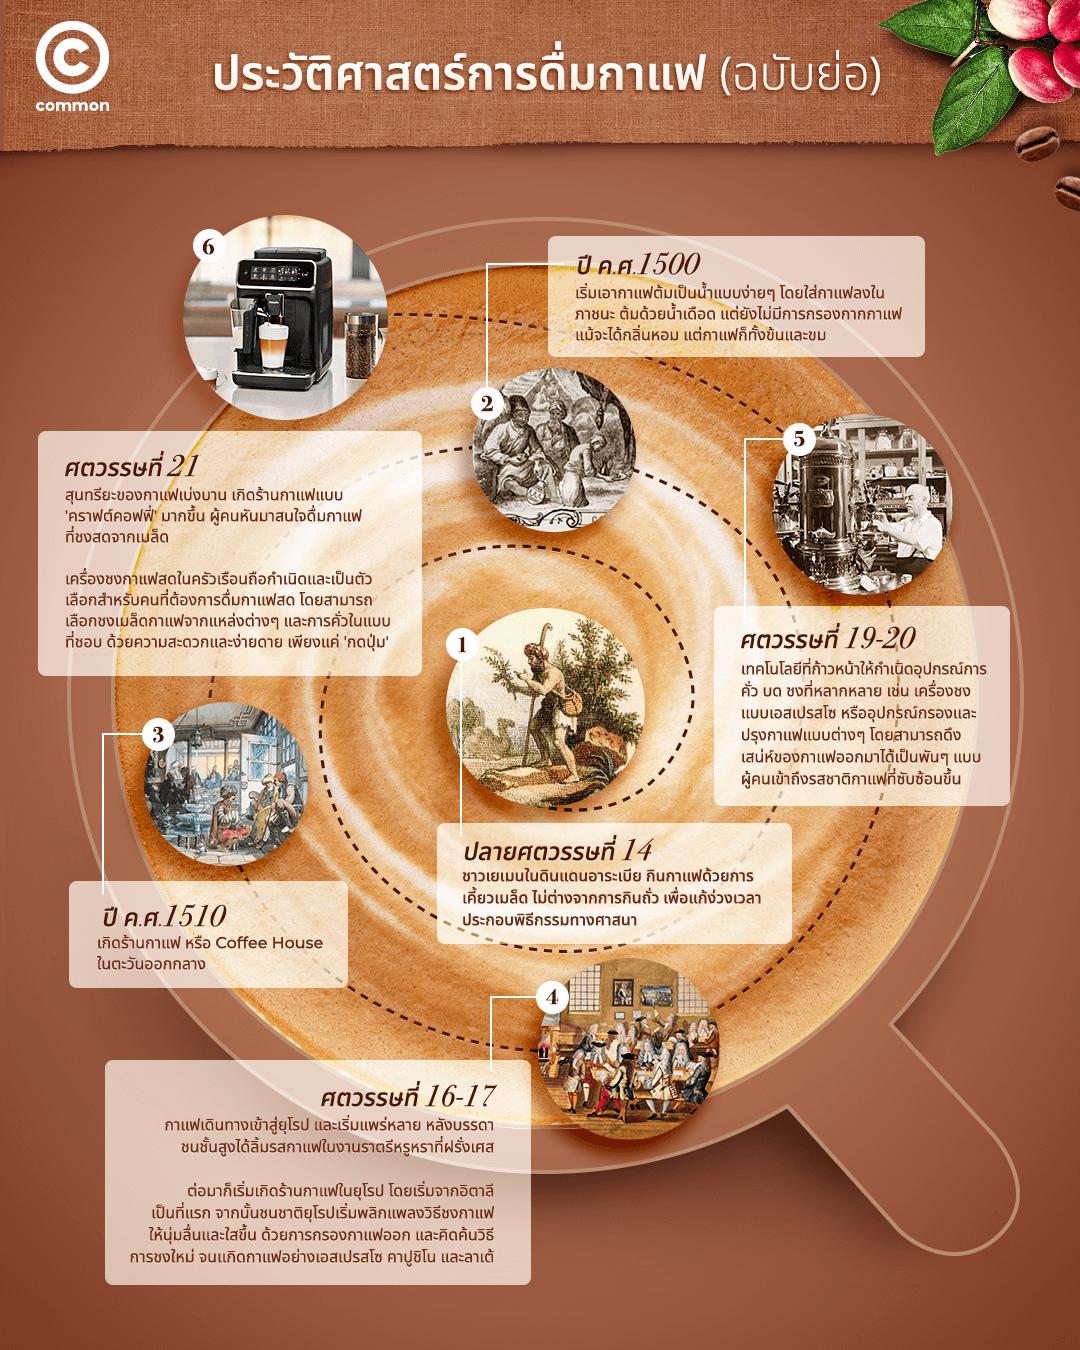 LatteGo Philips เครื่องชงกาแฟ ประวัติศาสตร์ กาแฟ